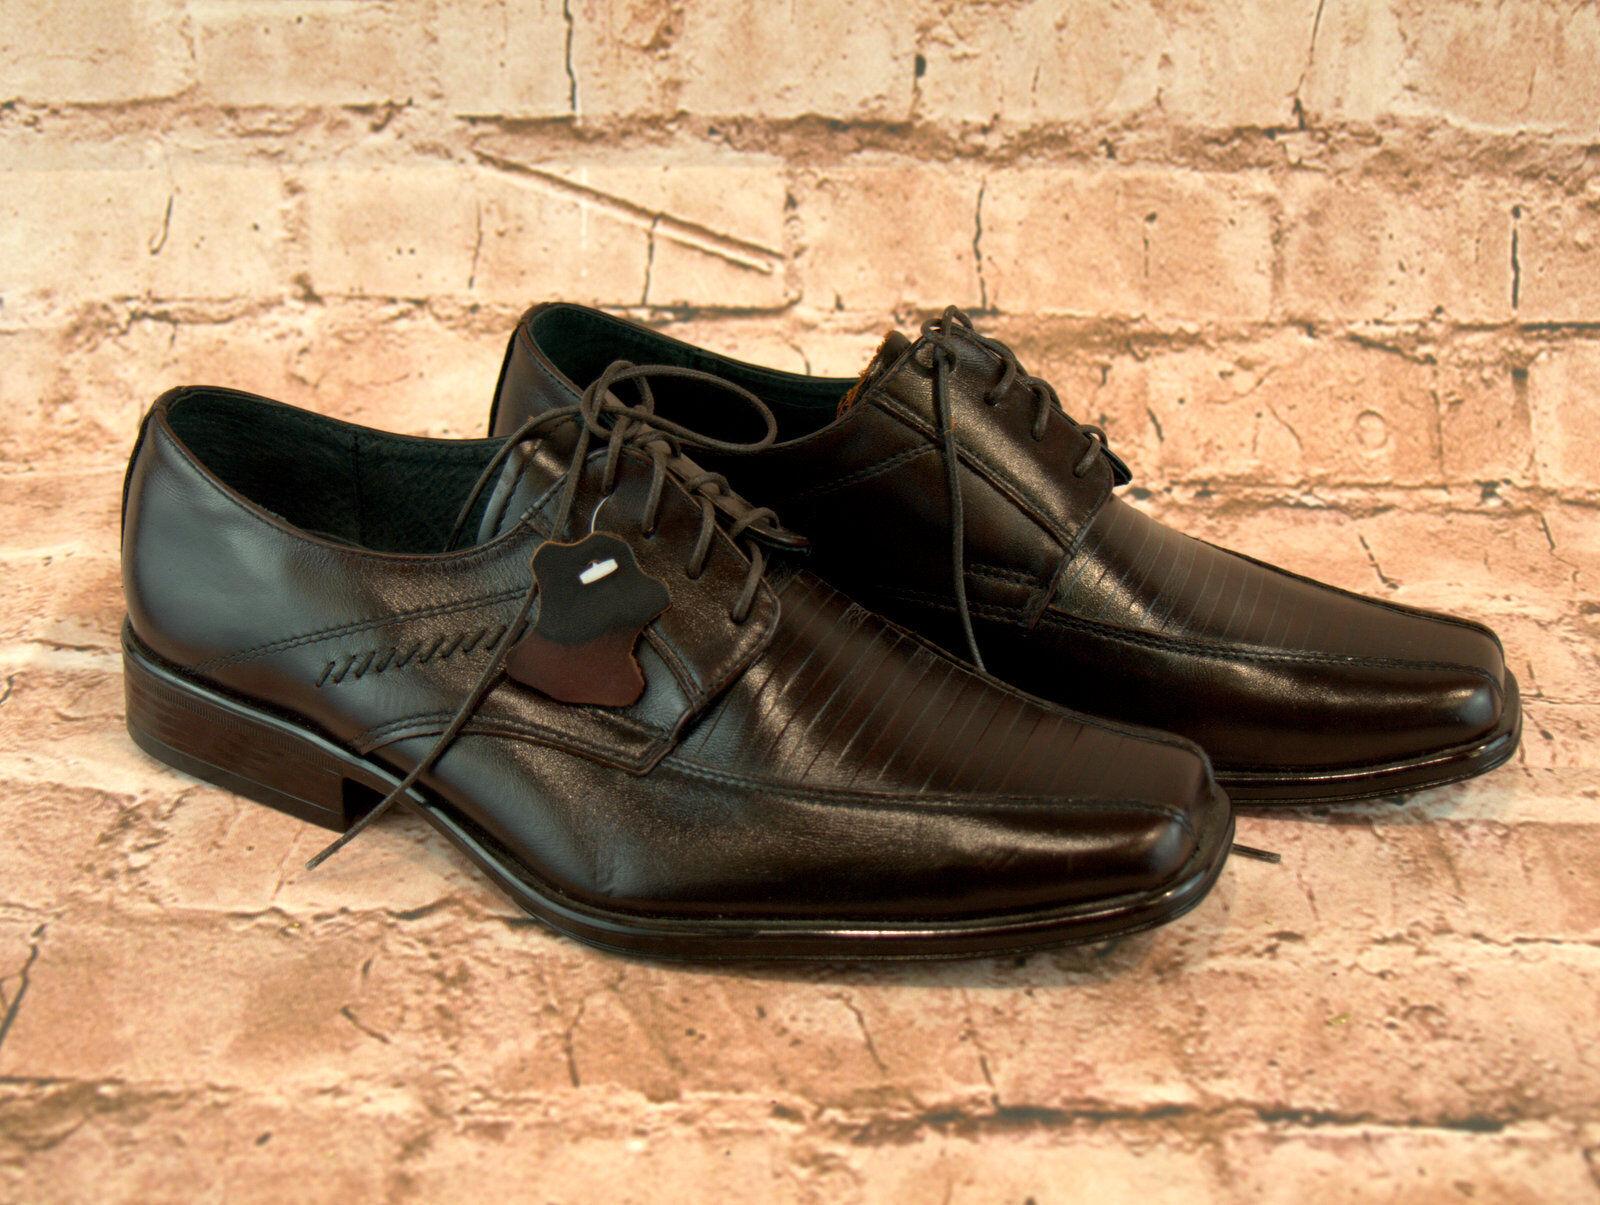 Chaussures Hommes Costume Chaussures Mariage festchaussures Elegant FETE ballerine taille 39-45